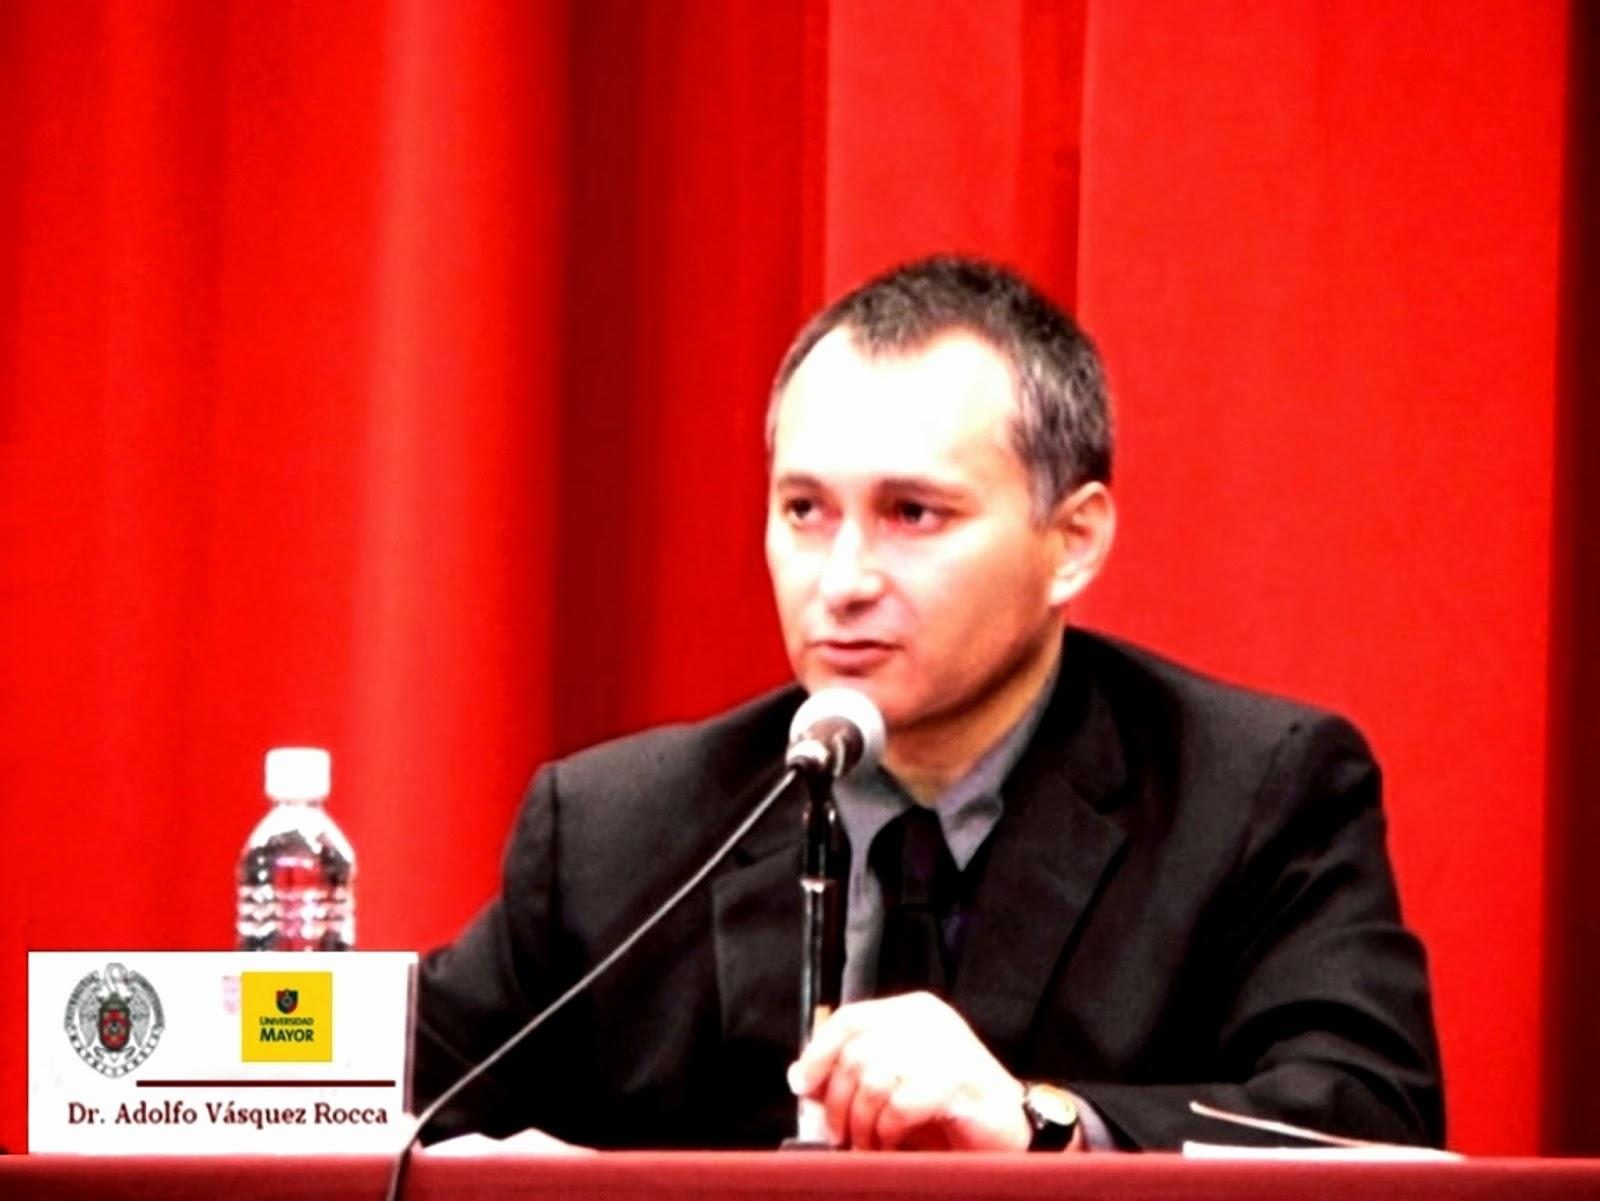 http://1.bp.blogspot.com/-XdOmHTdSkRQ/UloLgDOpM4I/AAAAAAAALFE/51MWCxd8mQk/s1600/Adolfo+Vasquez+Rocca+_++PHD+_+Doctor+en+Filosofia+_+Congreso+Internacional+de+Filosof%C3%ADa+.jpeg